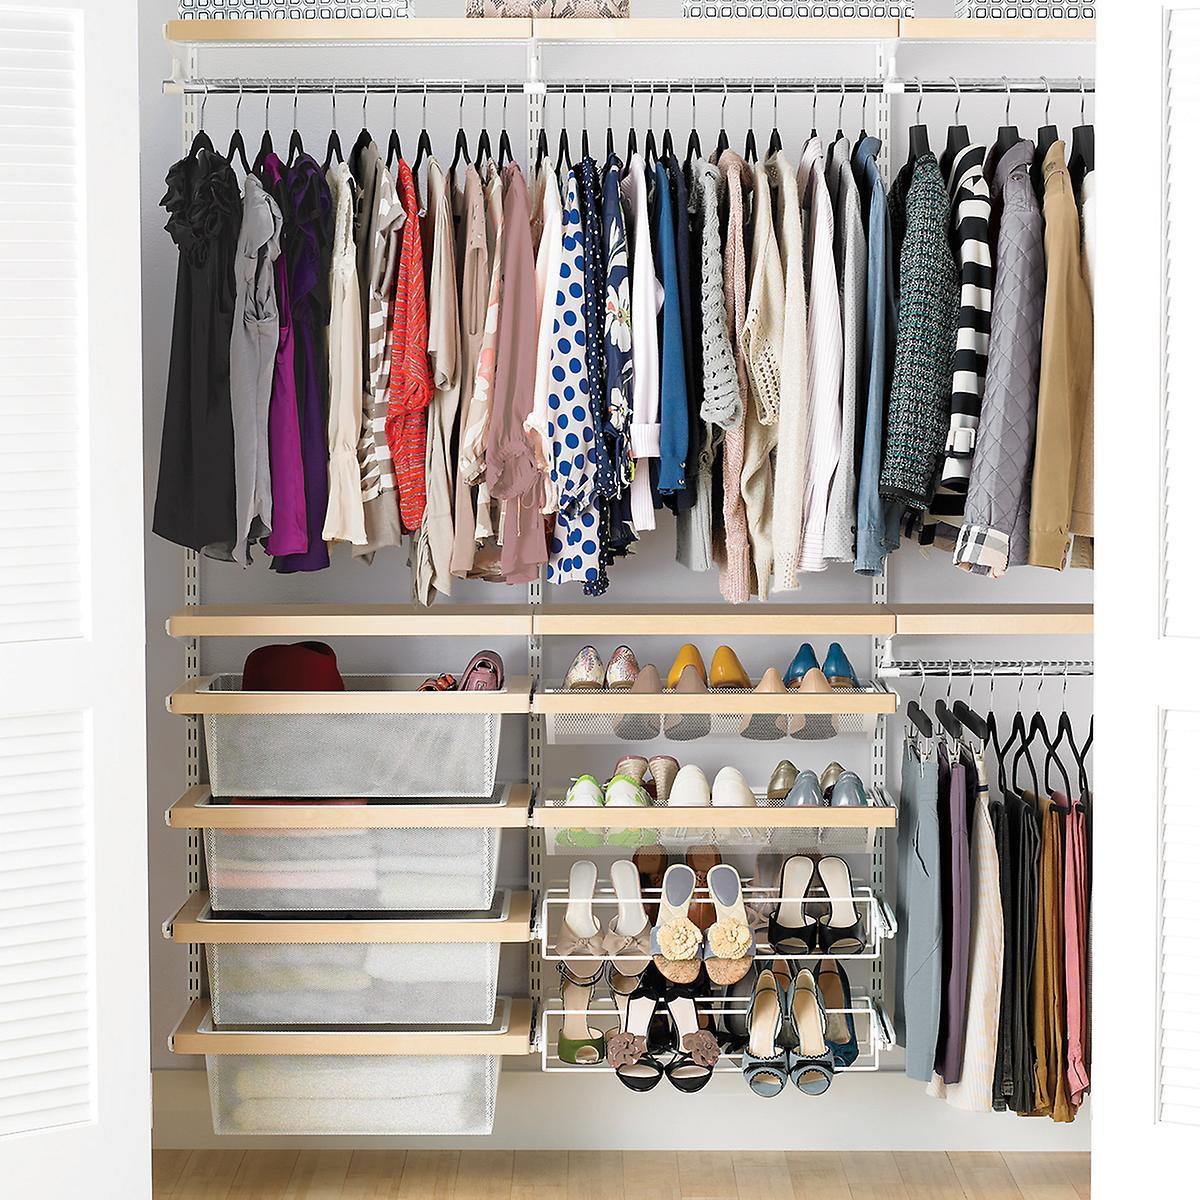 Birch White Elfa Decor Reach In Clothes Closet The Container Store